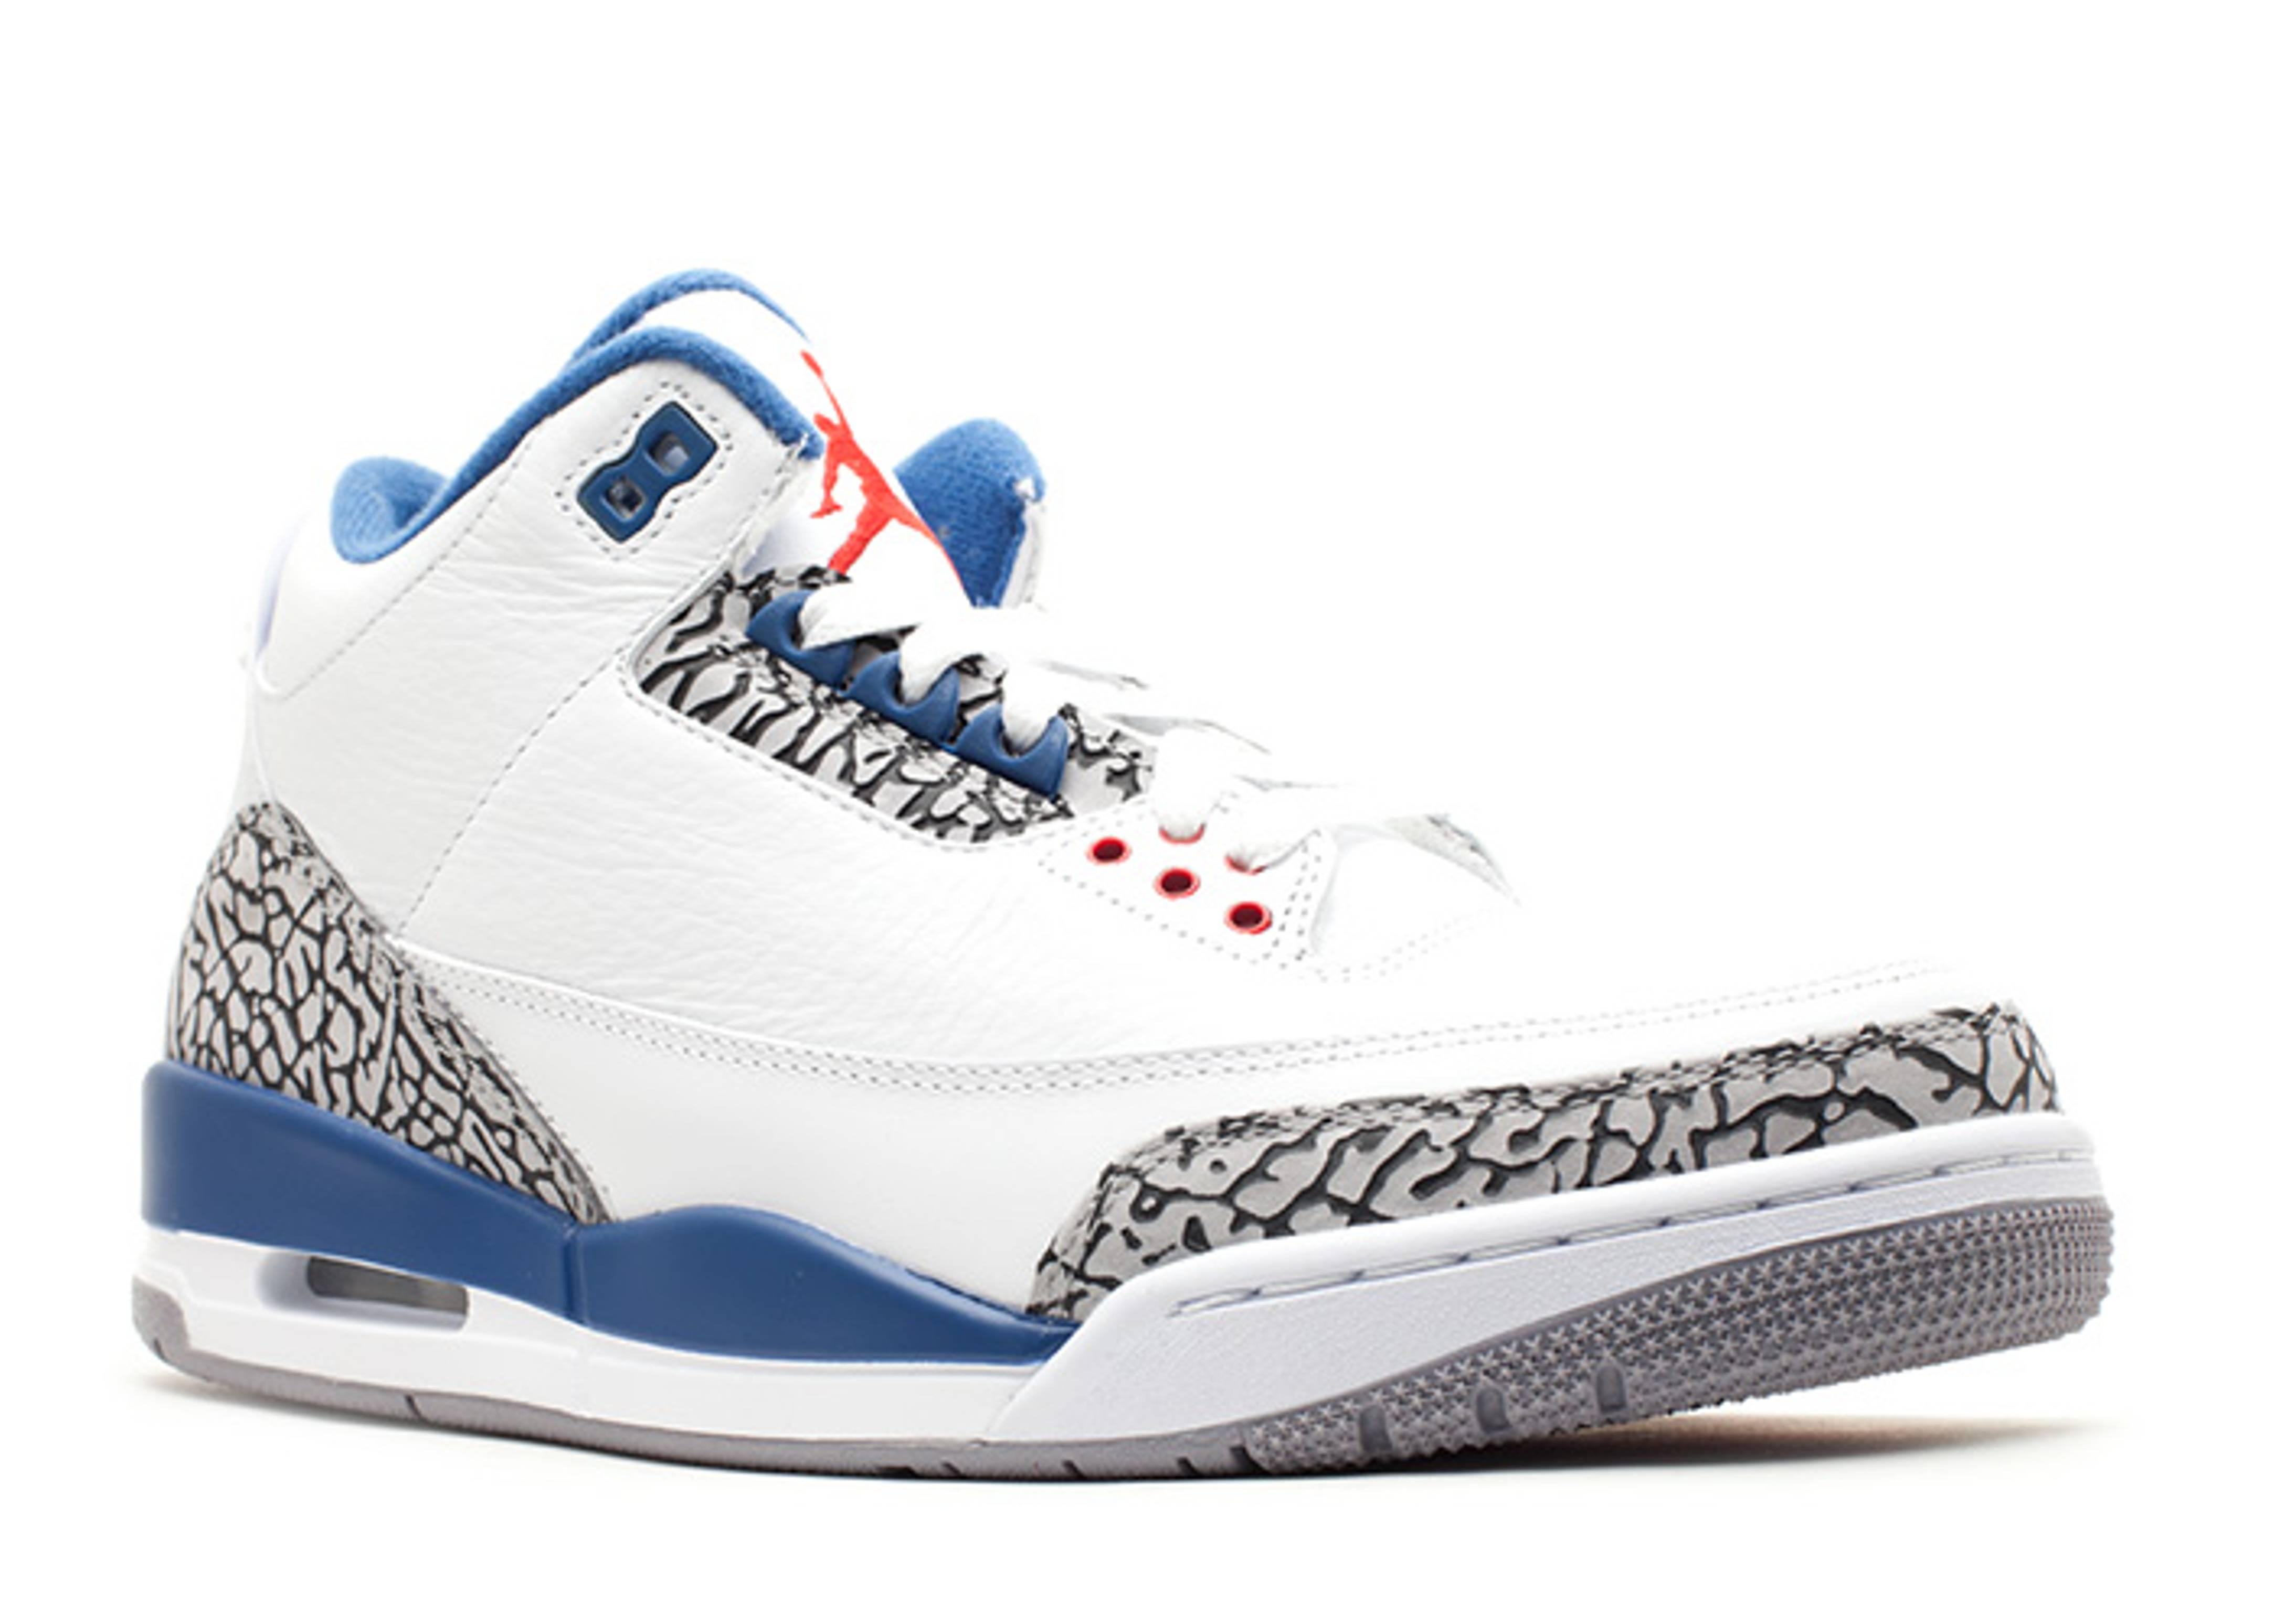 on sale e9b81 987d8 ... reduced air jordan 3 retro true blue 2011 release white true blue  0113912 4f48f 1b573